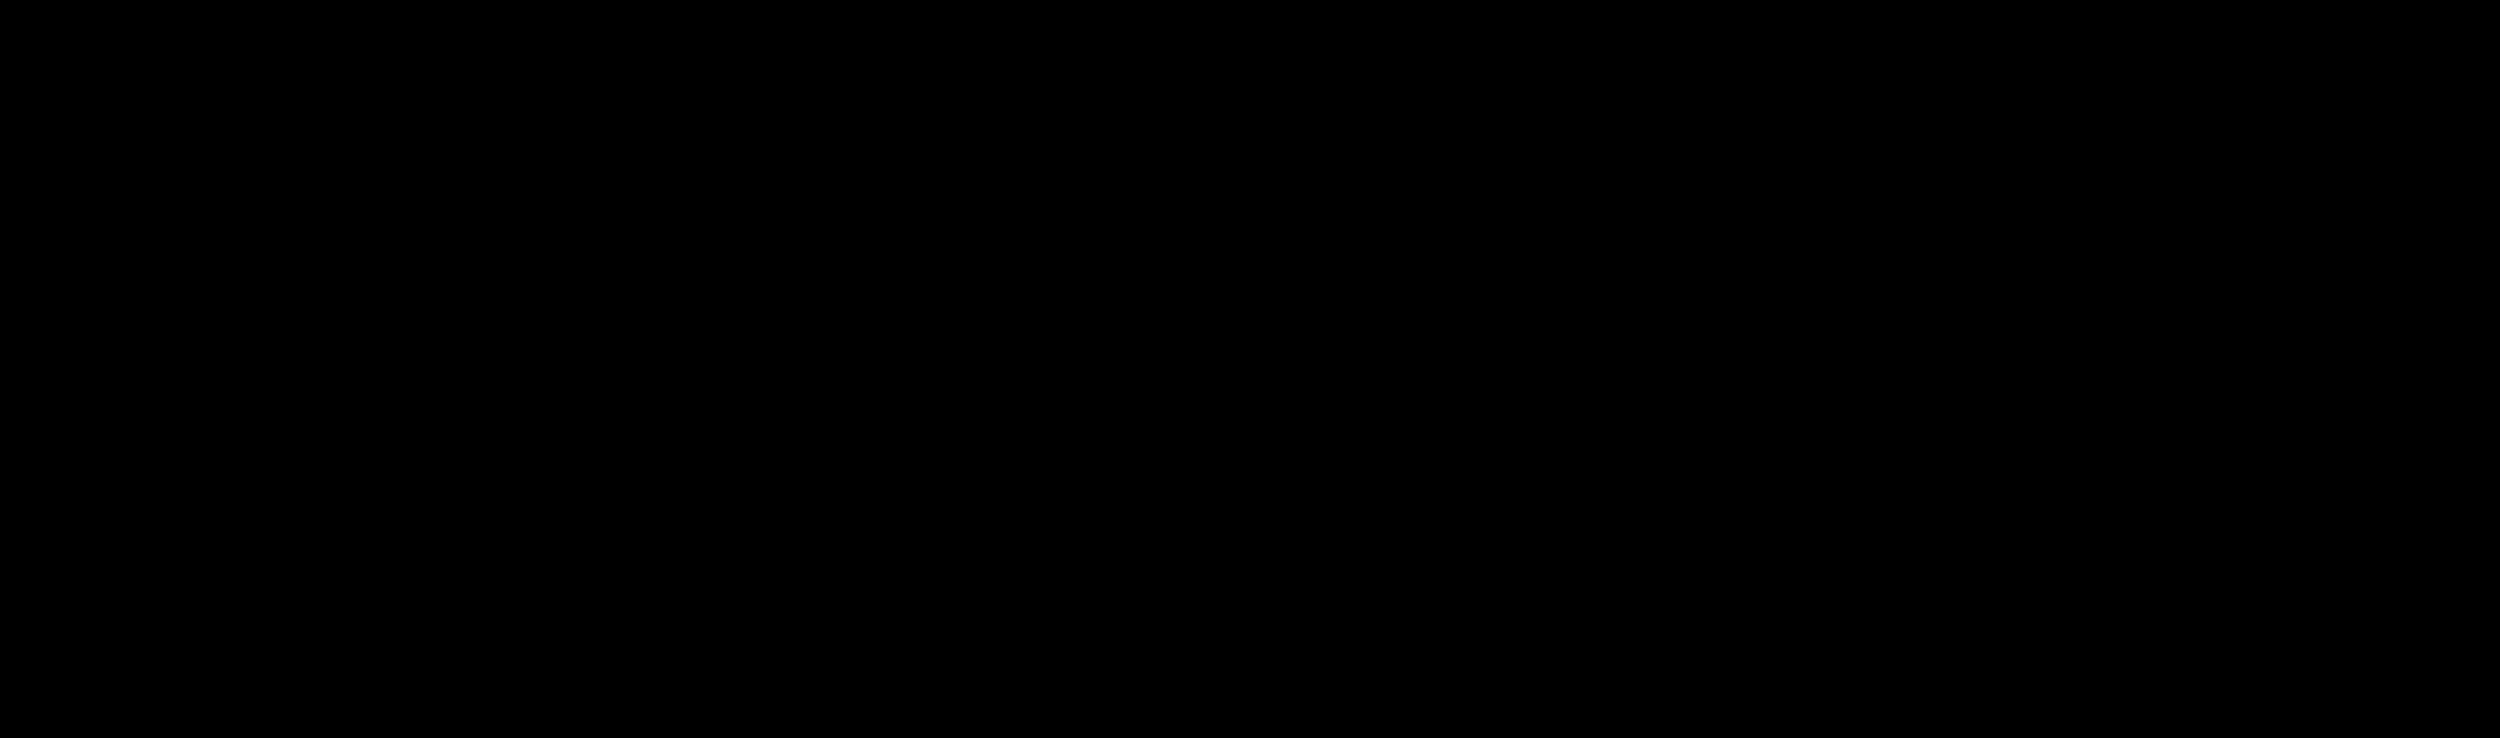 Te Manawa logo_main black.png